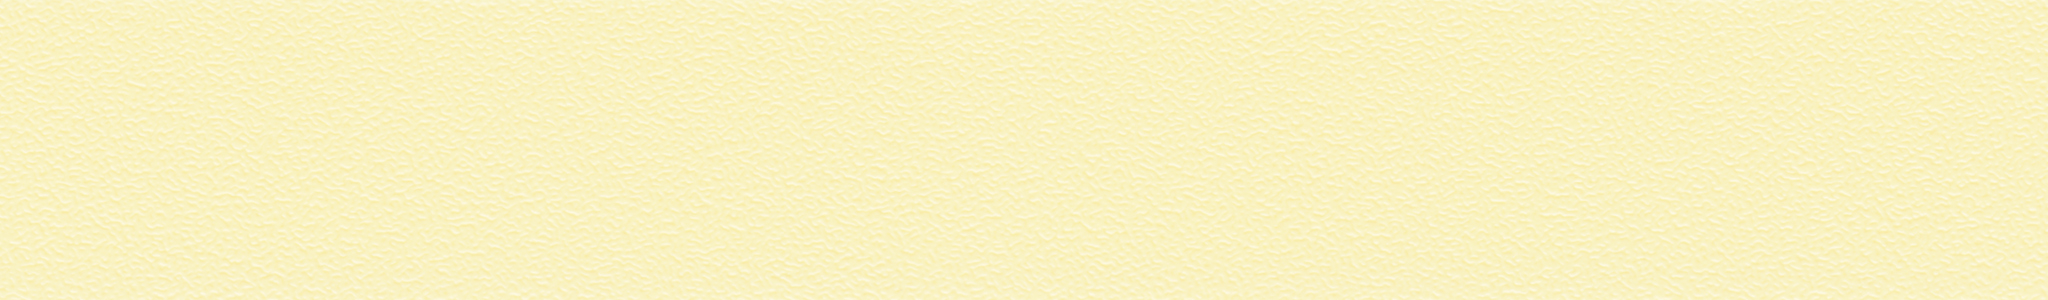 HU 11107 кромка ABS желтая светлая жемчуг 101